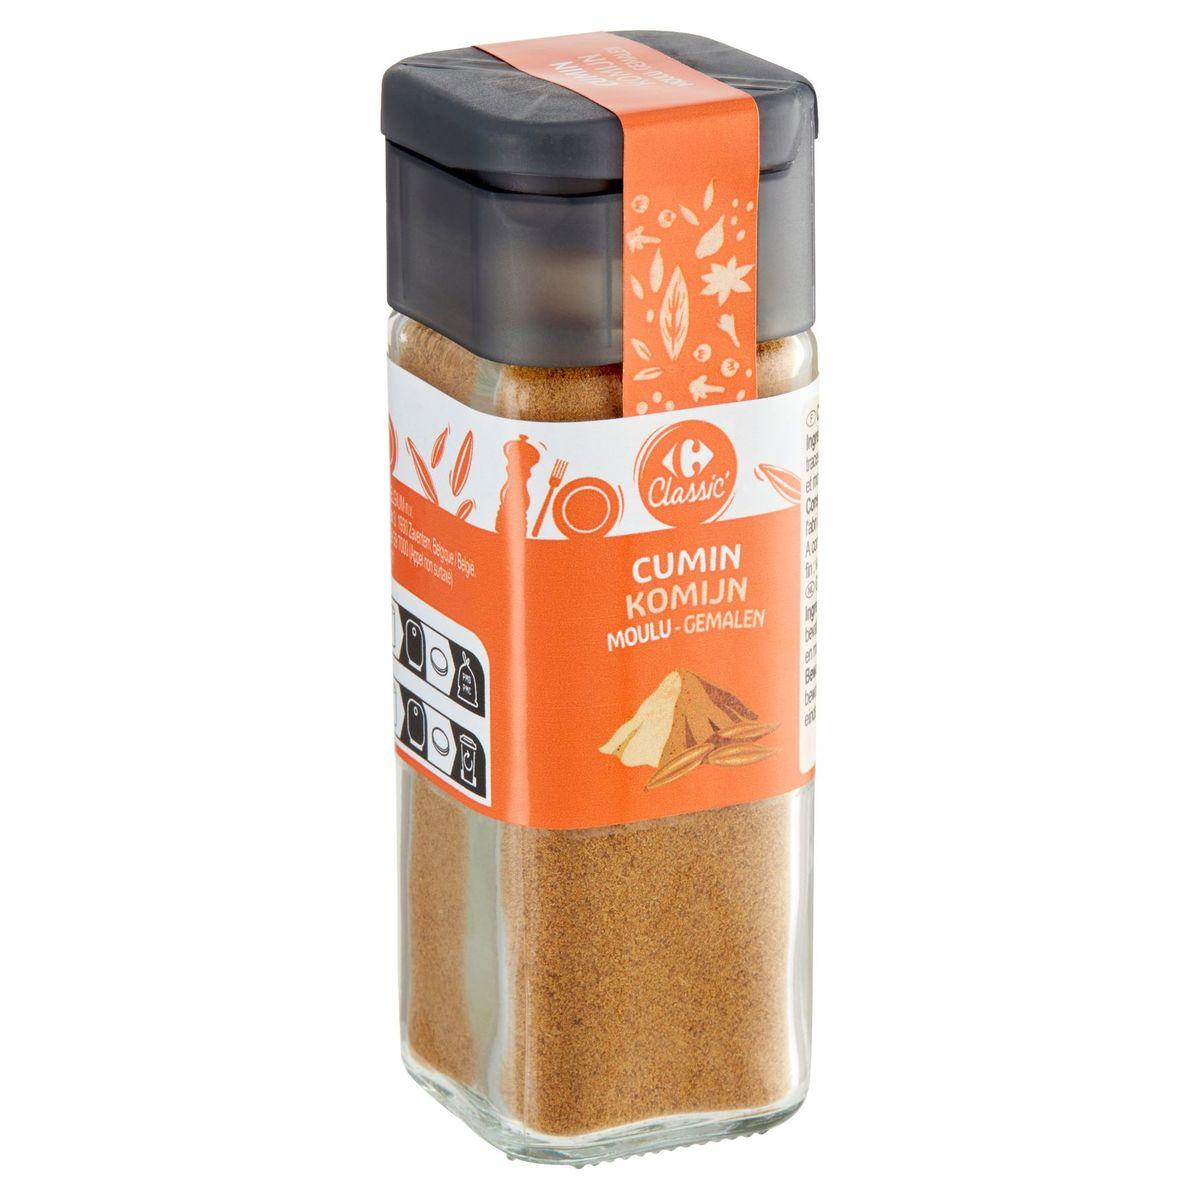 Carrefour Komijn Gemalen 35 g